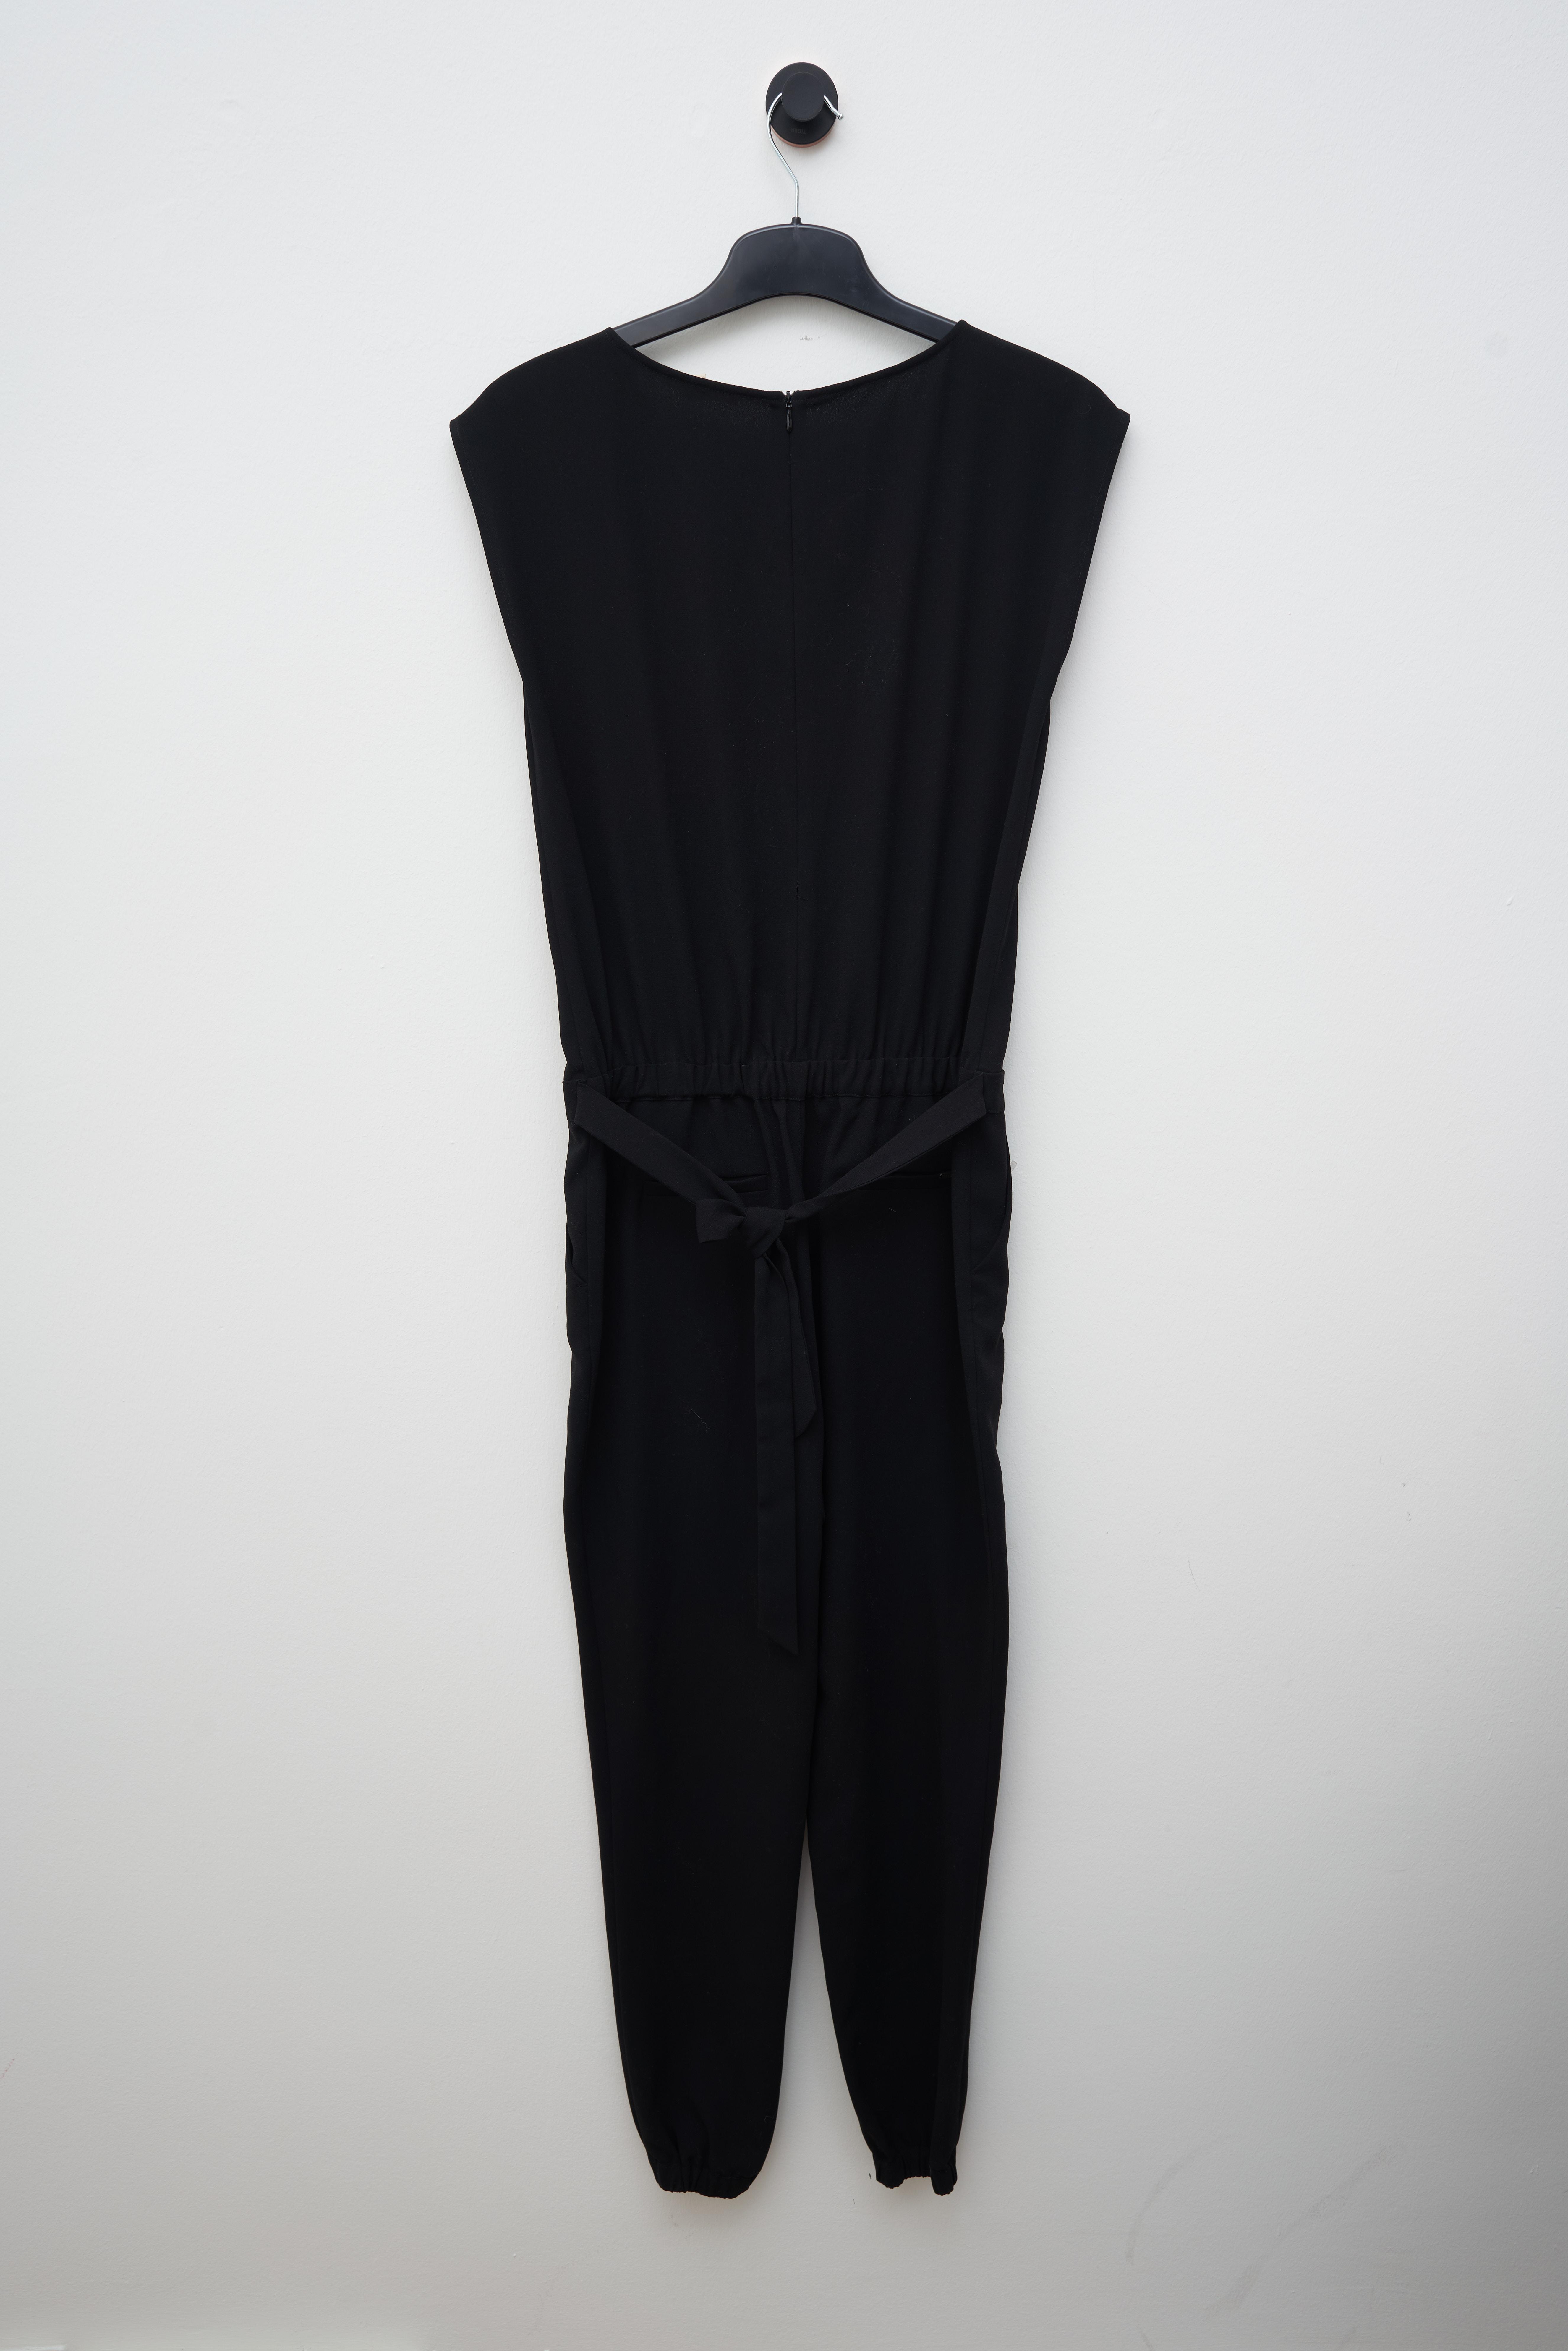 Esprit Jumpsuit / Overall Schwarz Gr.36